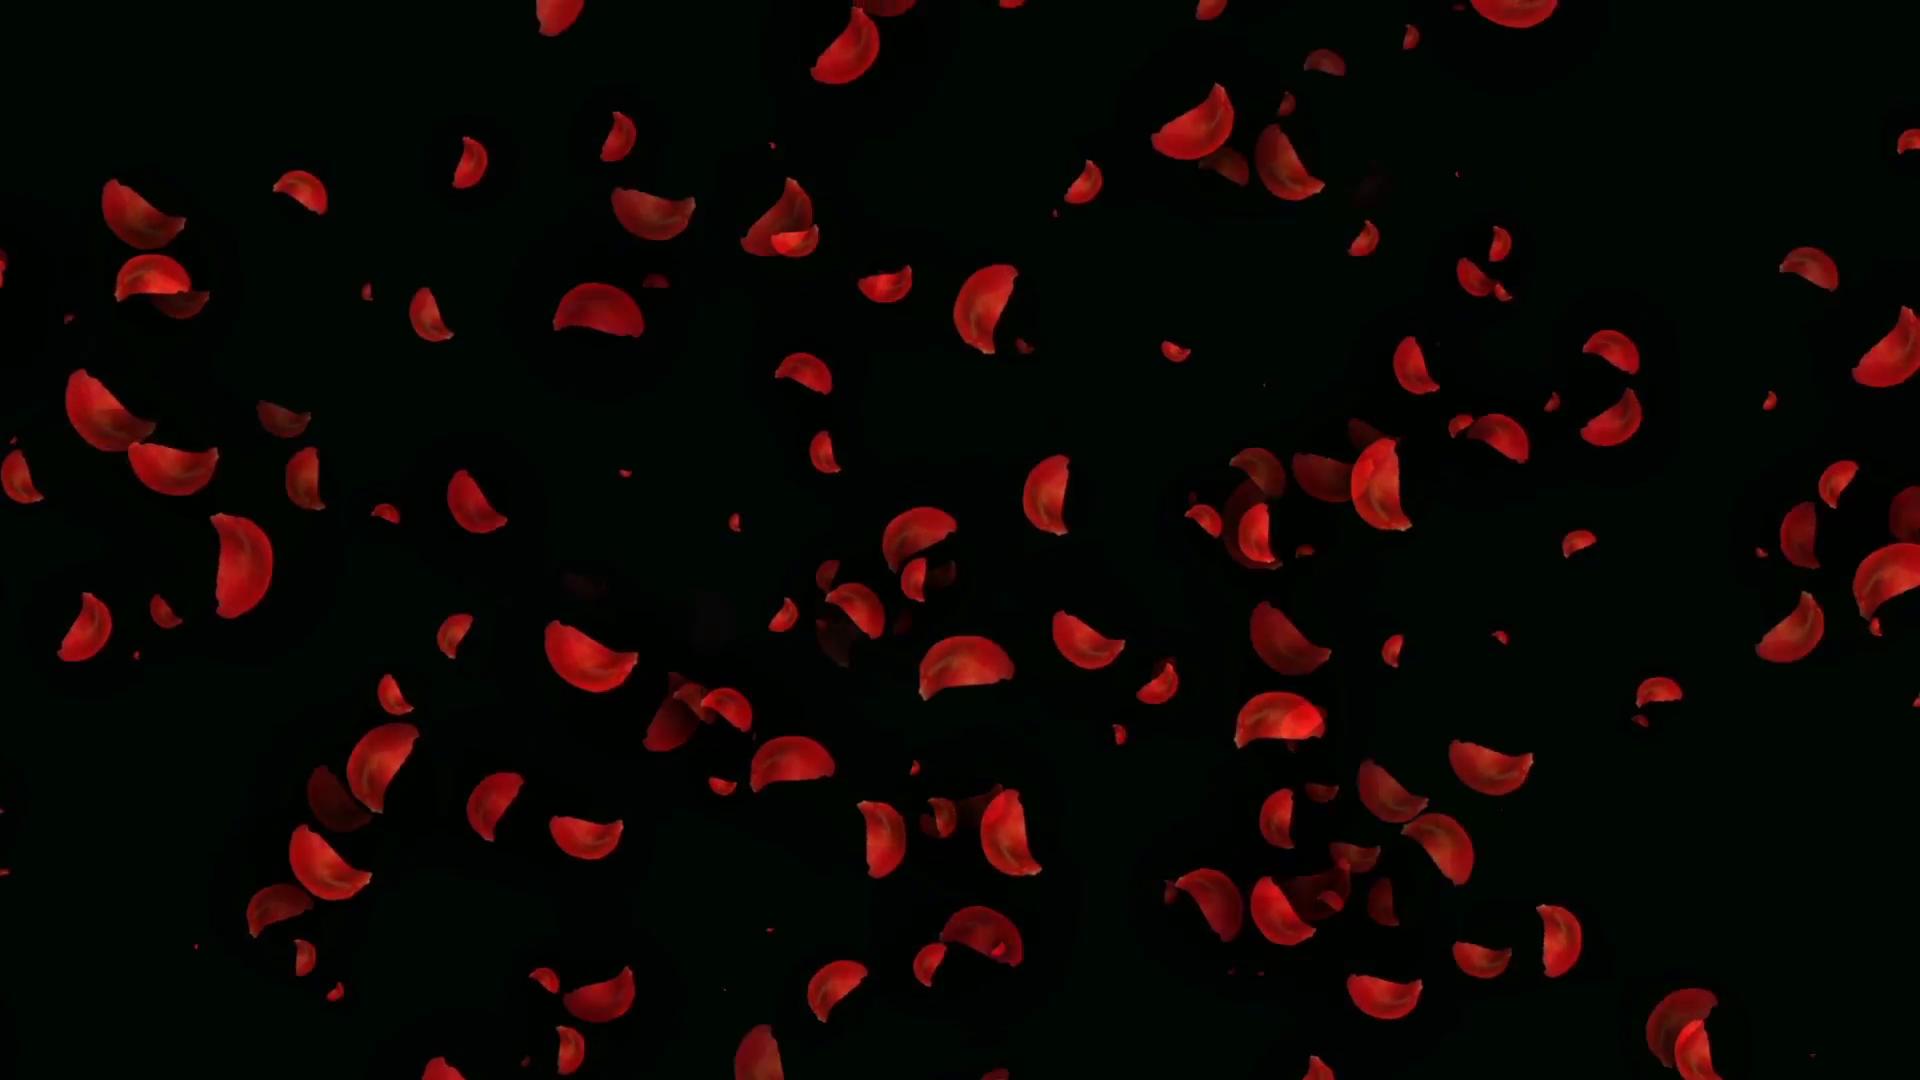 Falling Rose Petals on Black Motion Background - Videoblocks